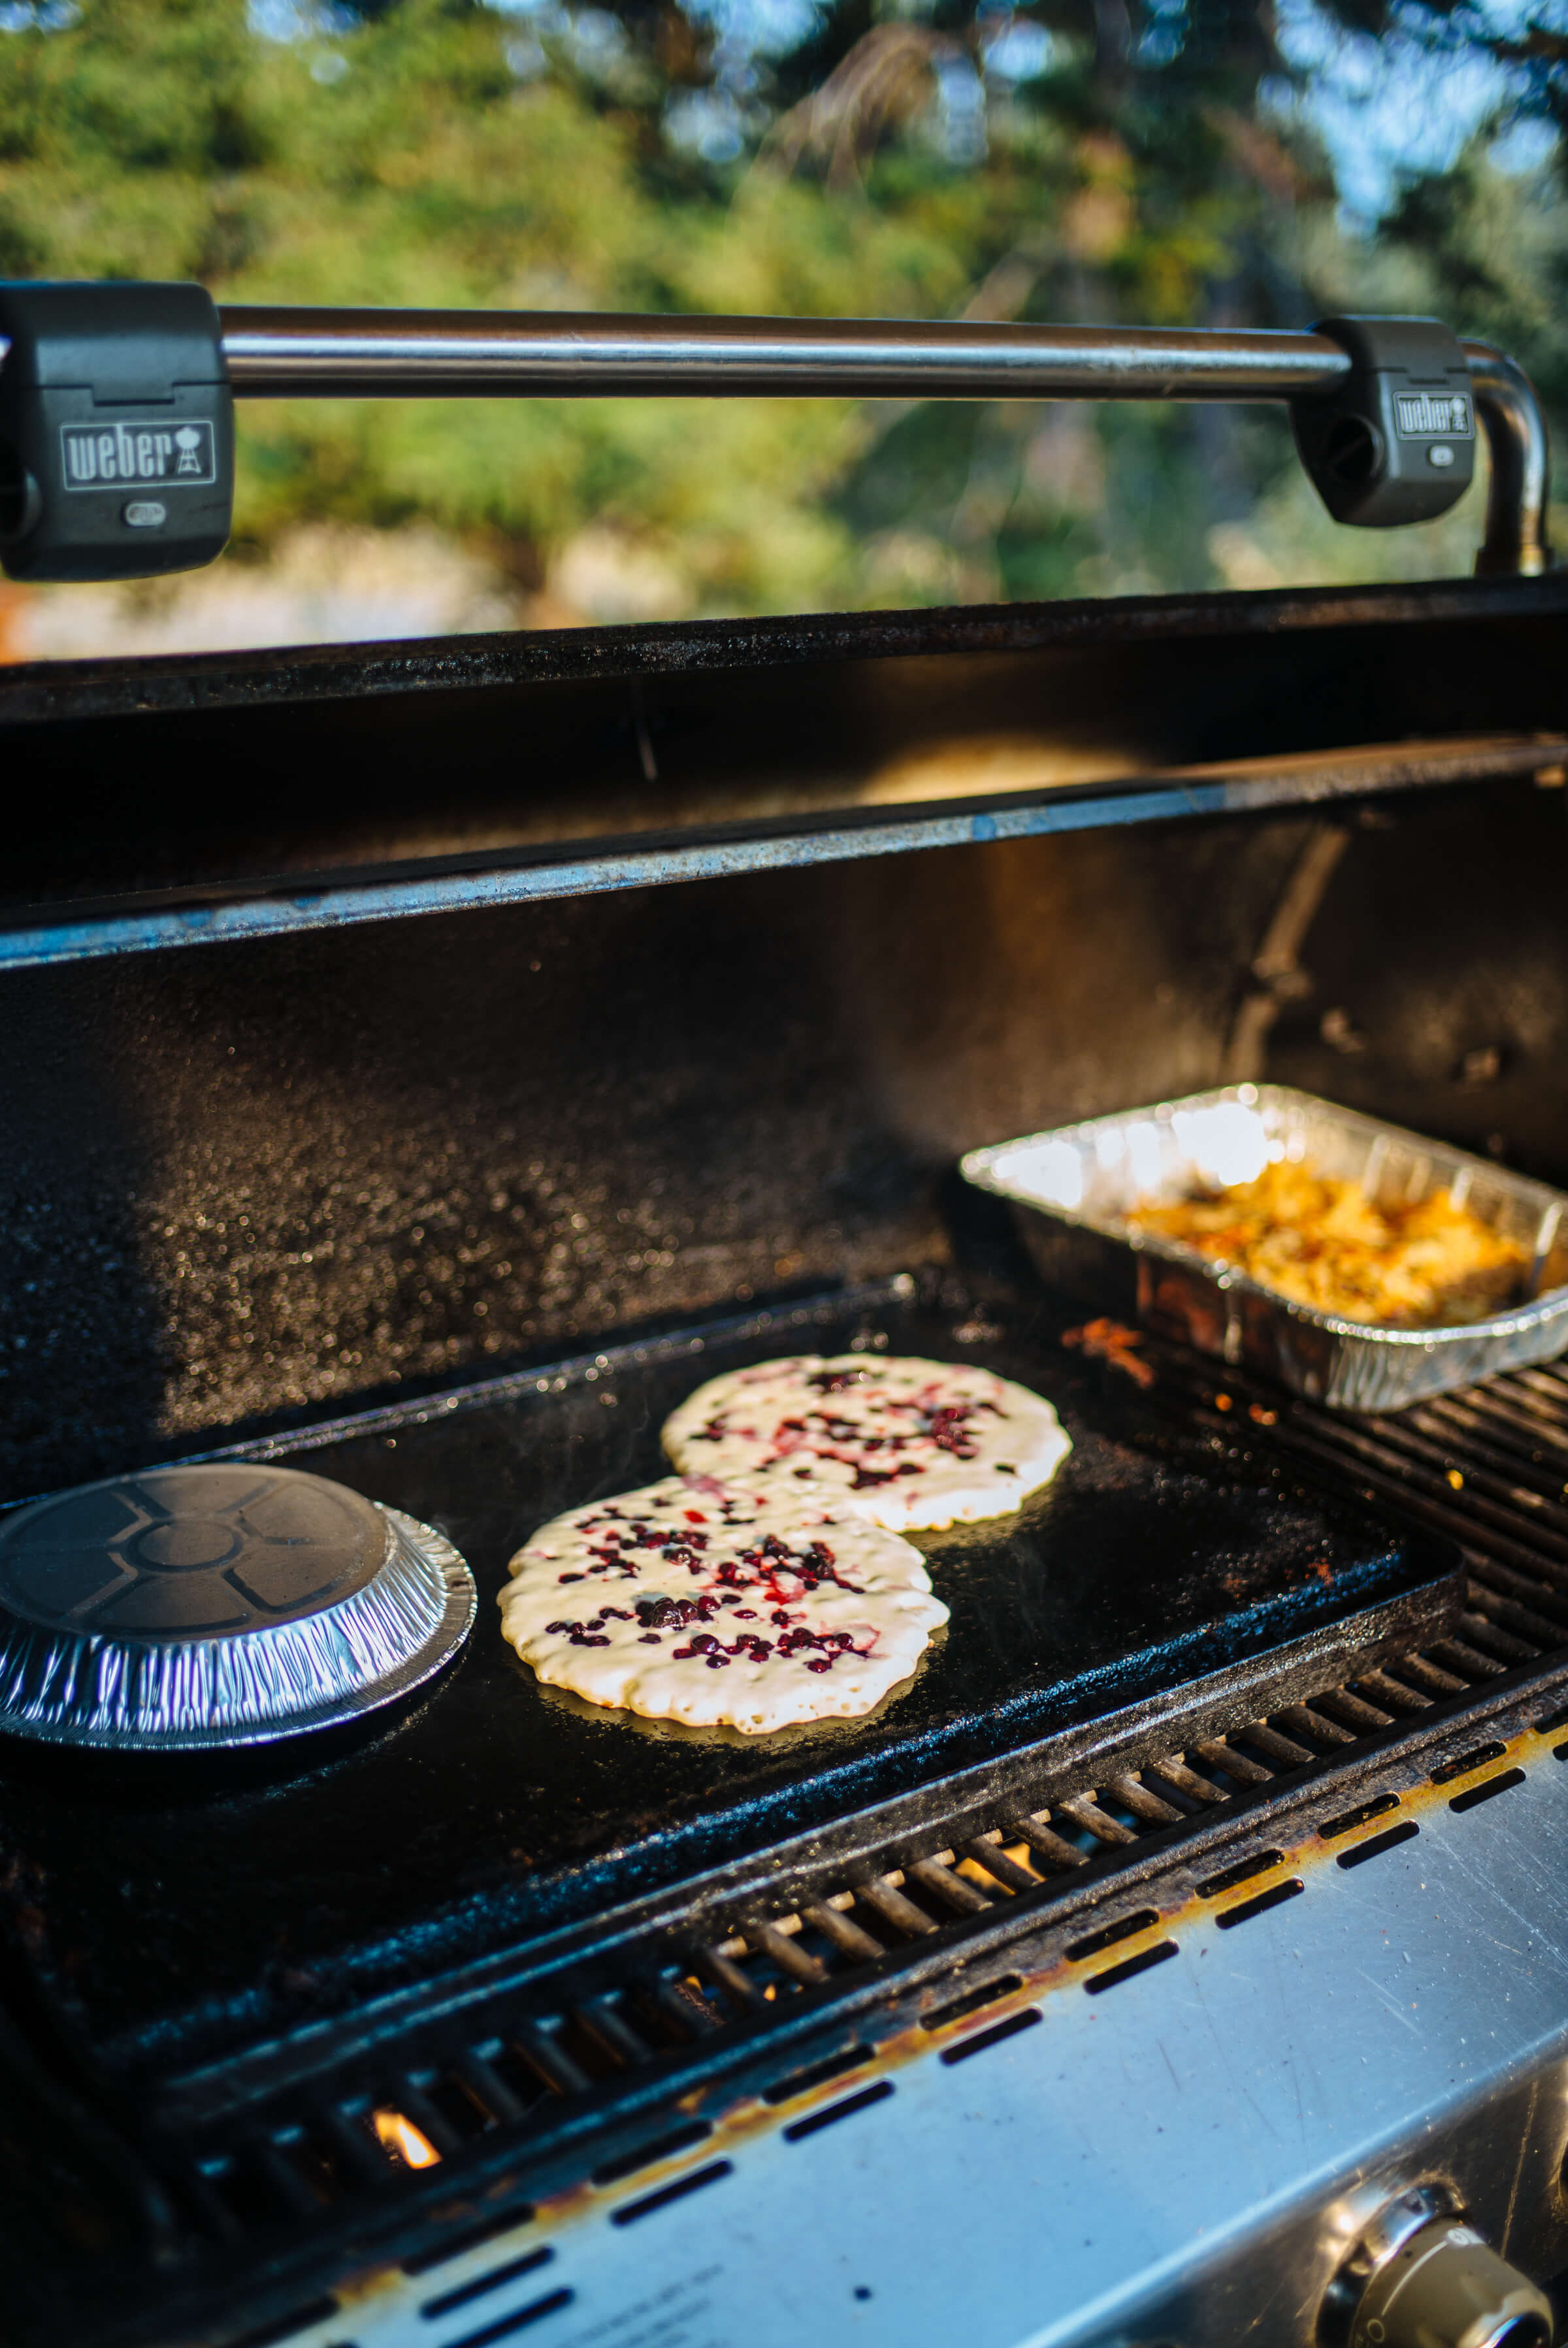 PAWSUP-montana-breakfast-pancakes-thetastesf-1002099.jpg